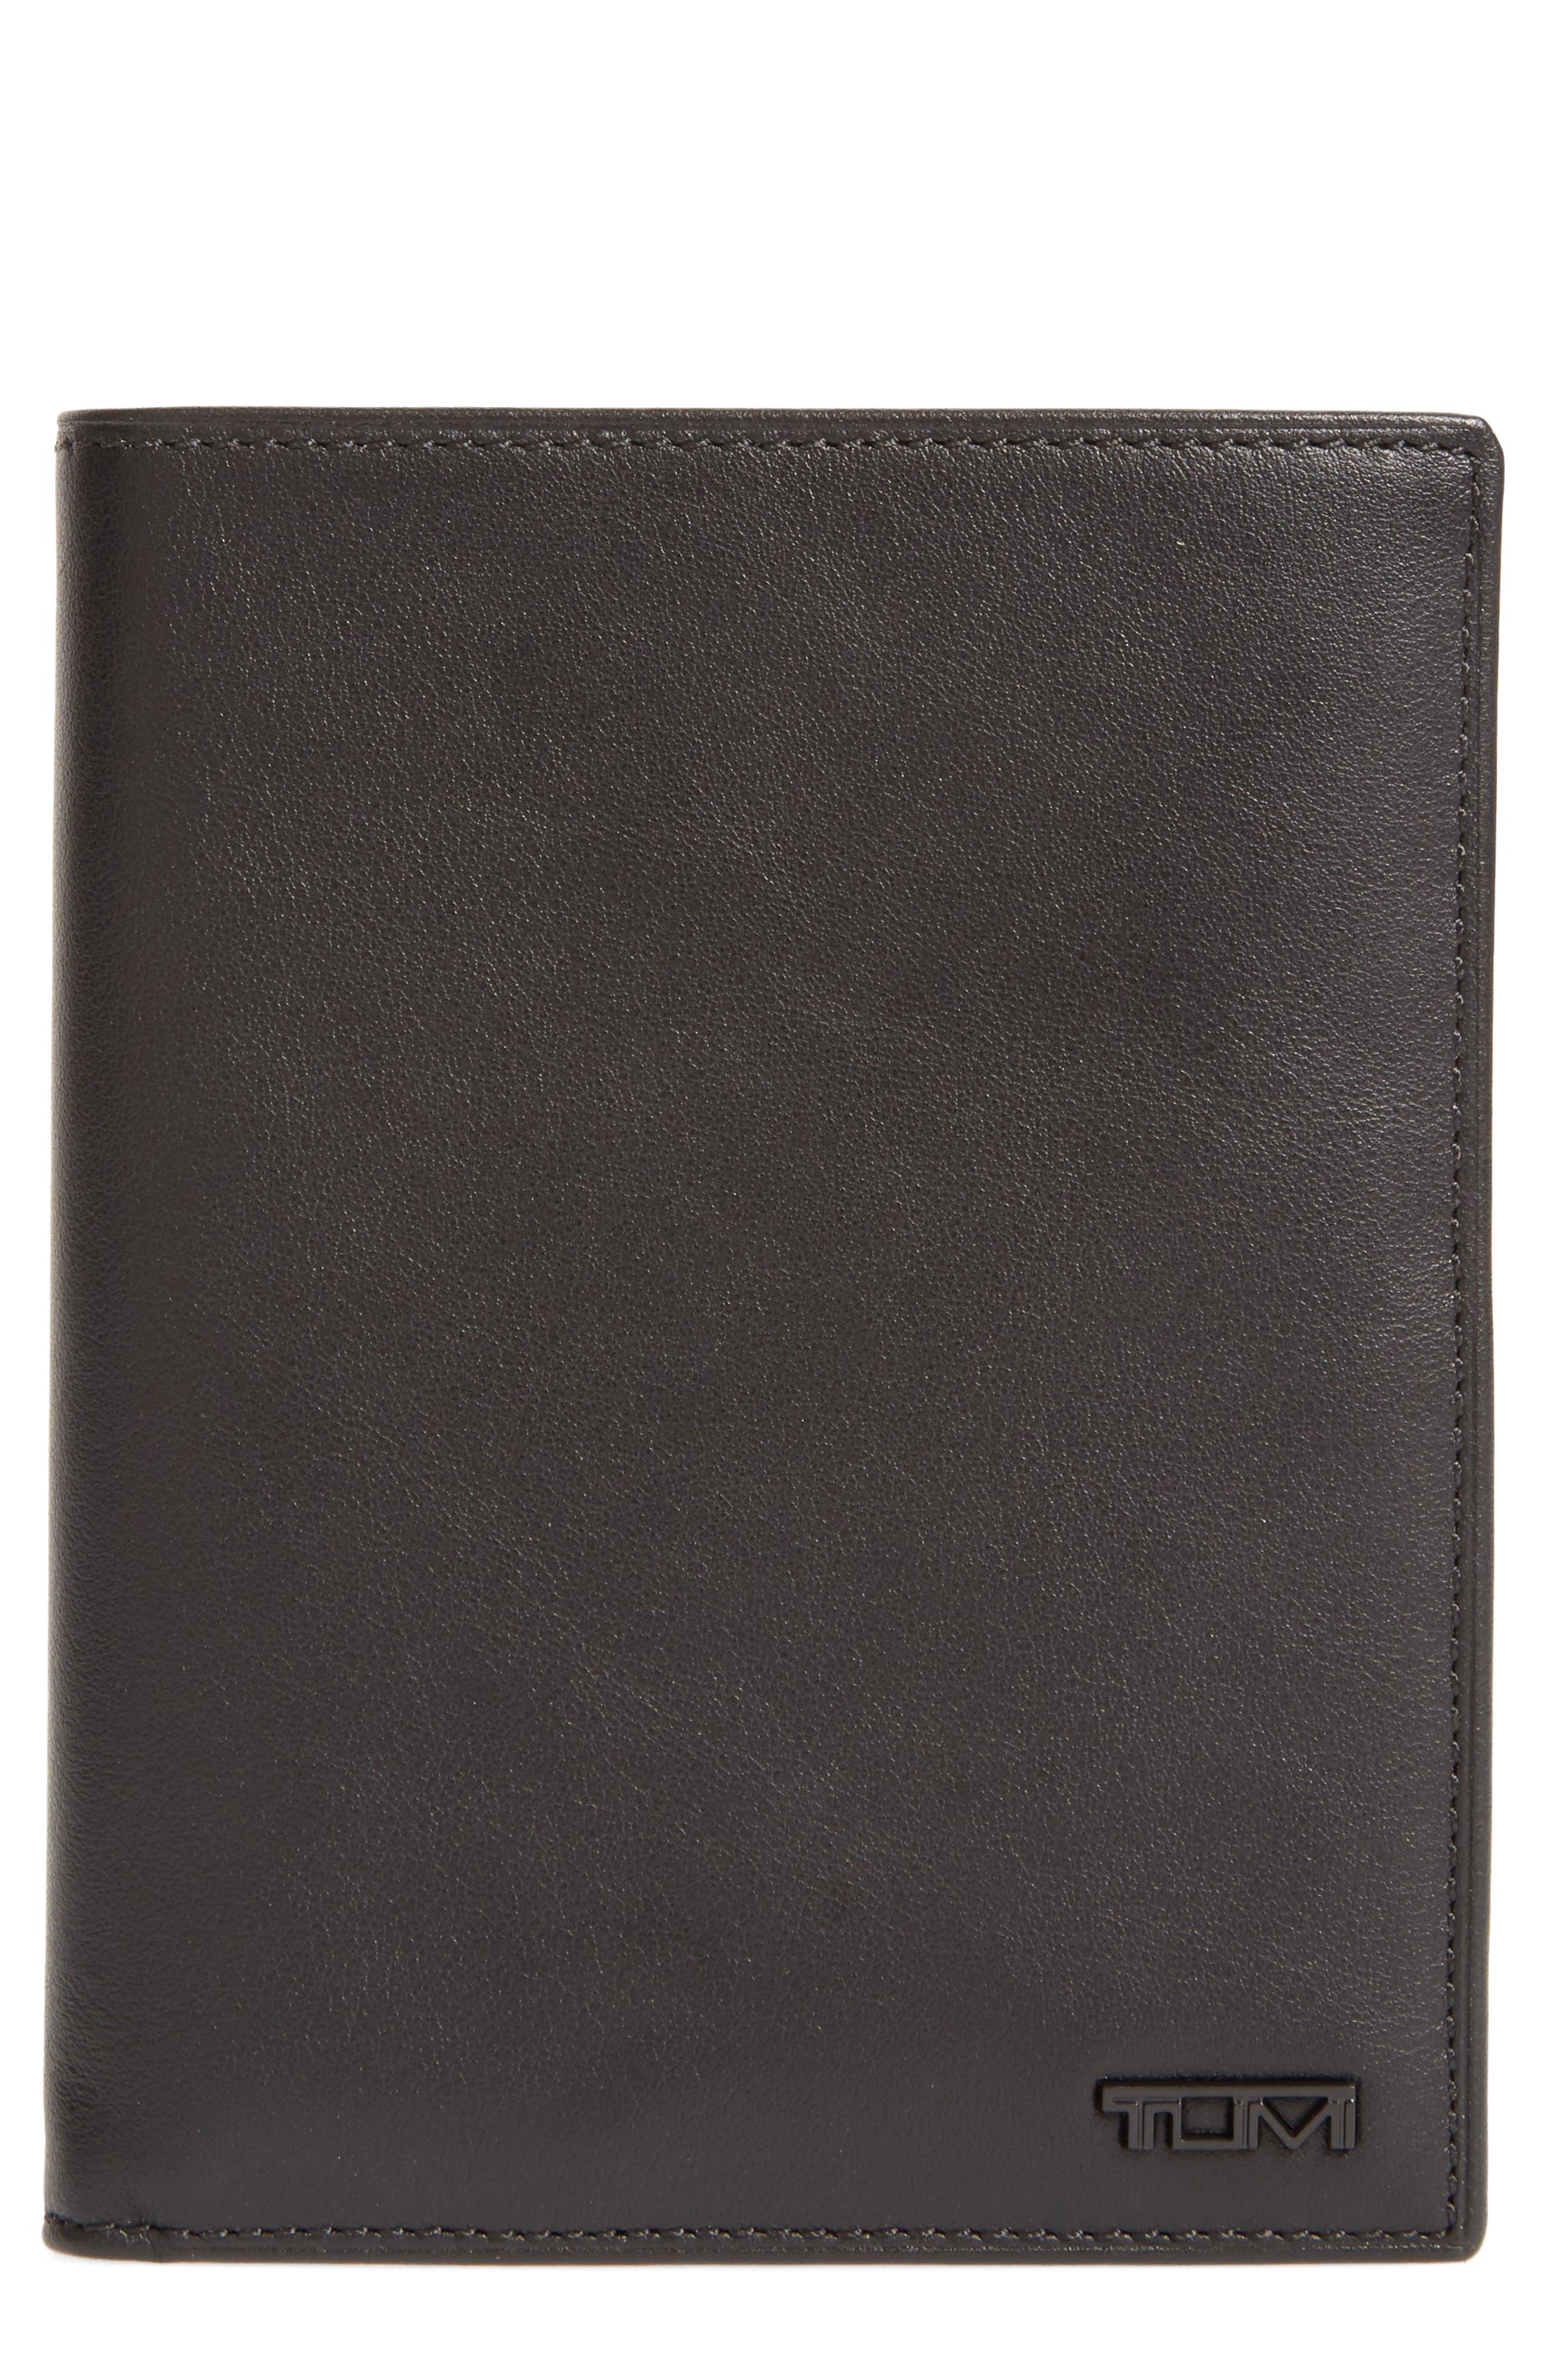 Main Image - Tumi Delta Passport Case